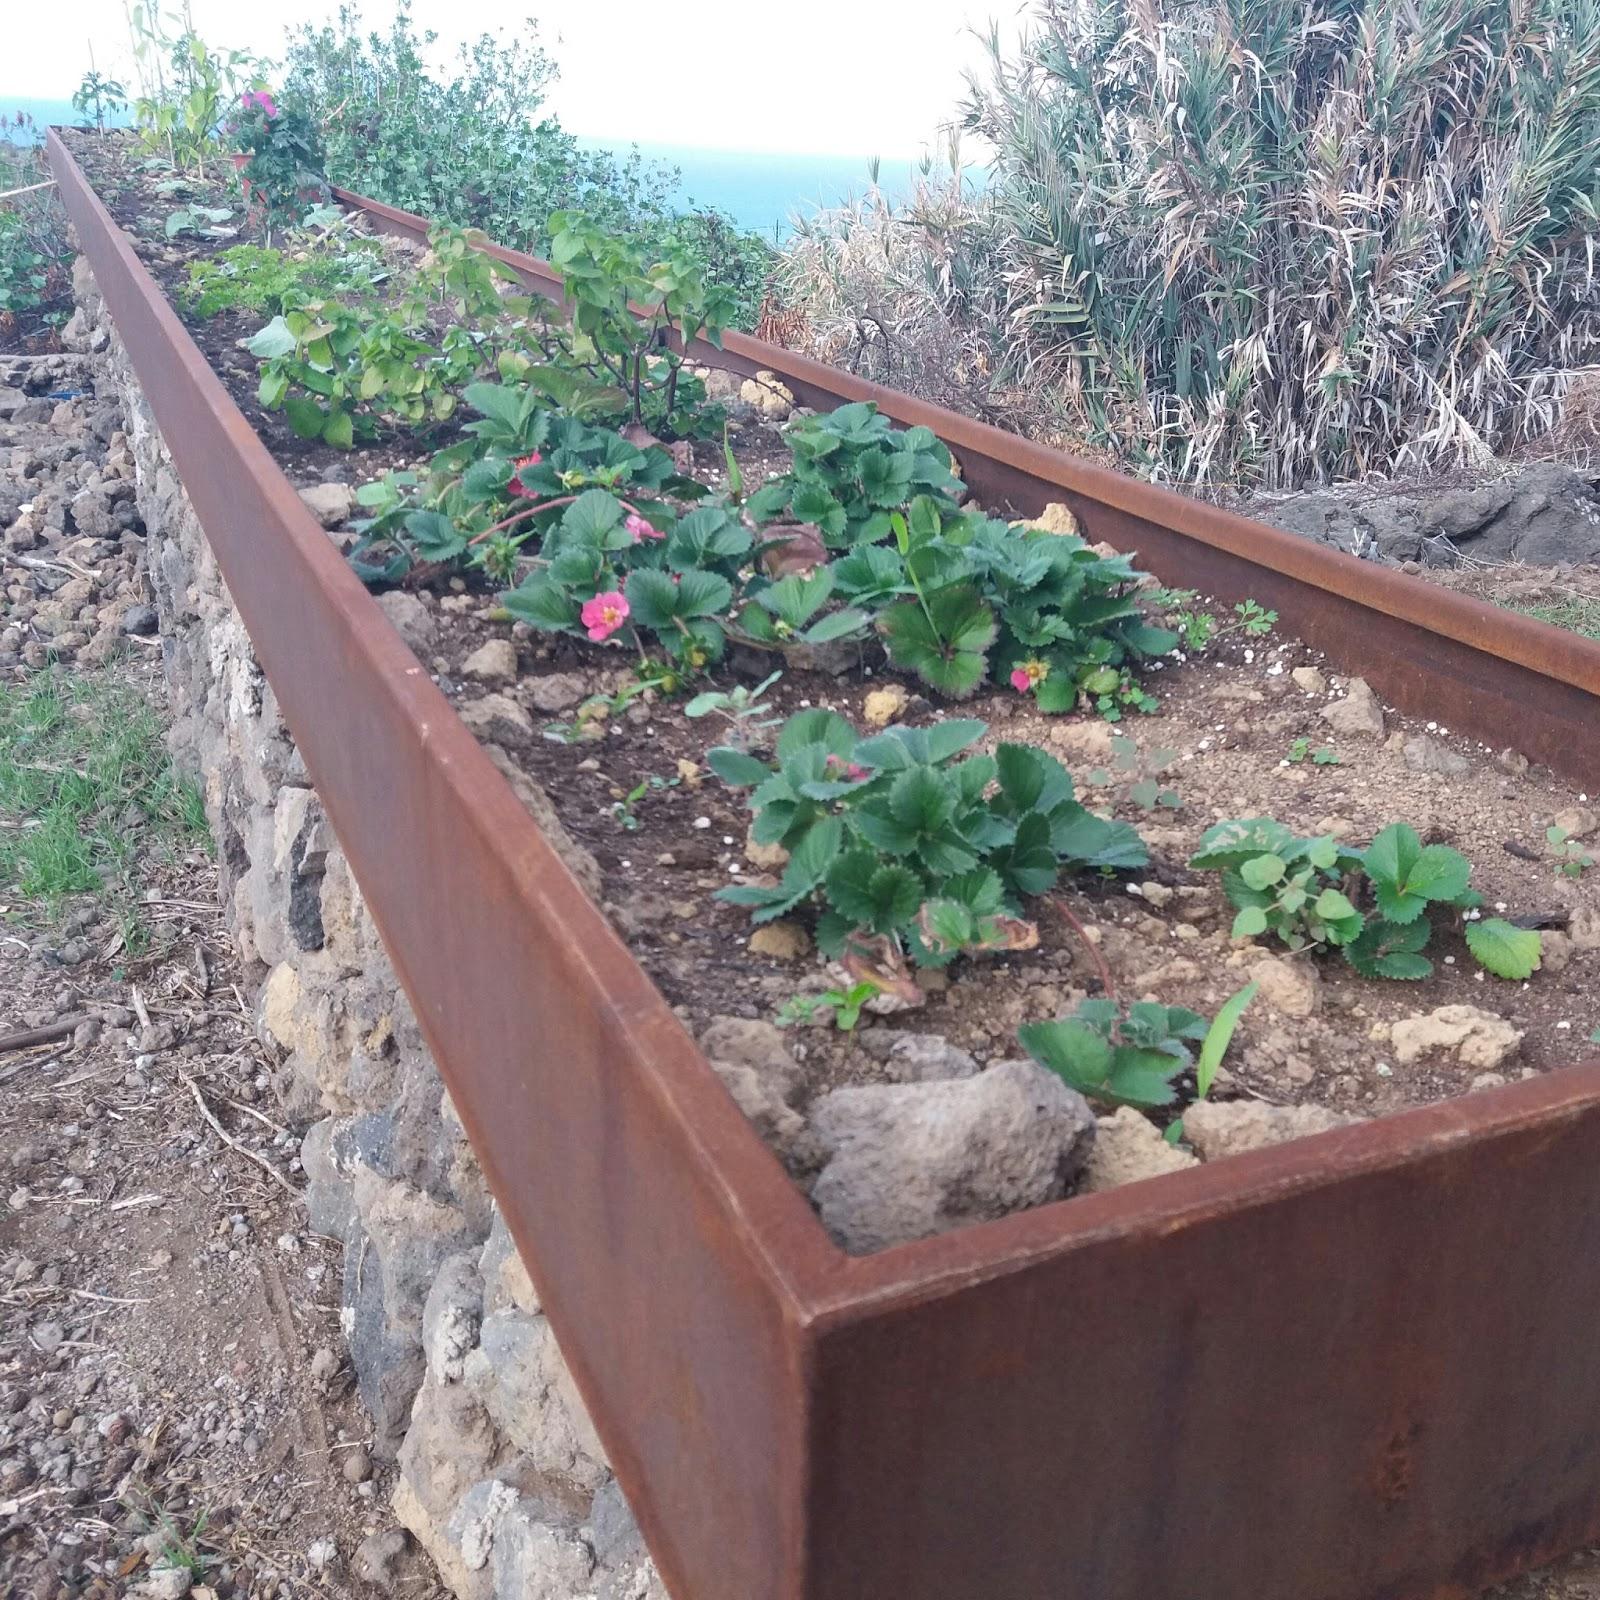 Acero inoxidable tenerife jardineras acero corten - Jardineras acero corten ...